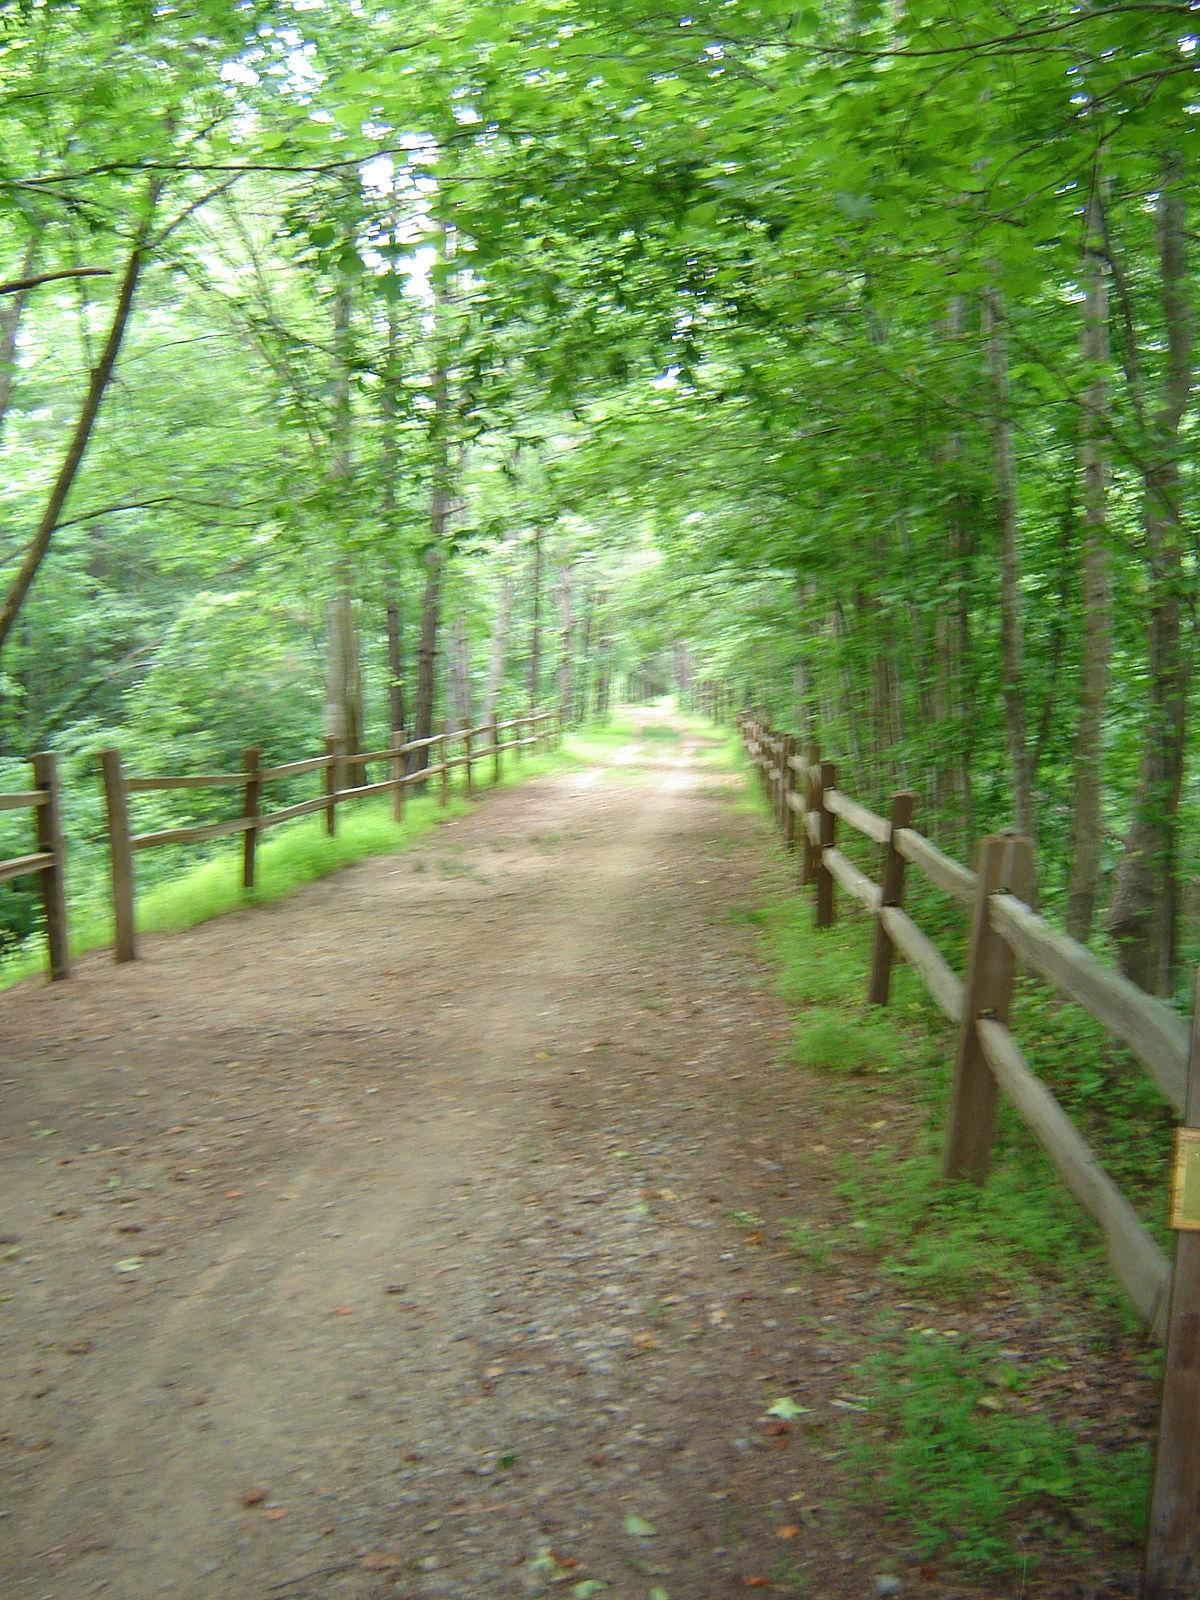 East Coast Greenway - Wikipedia